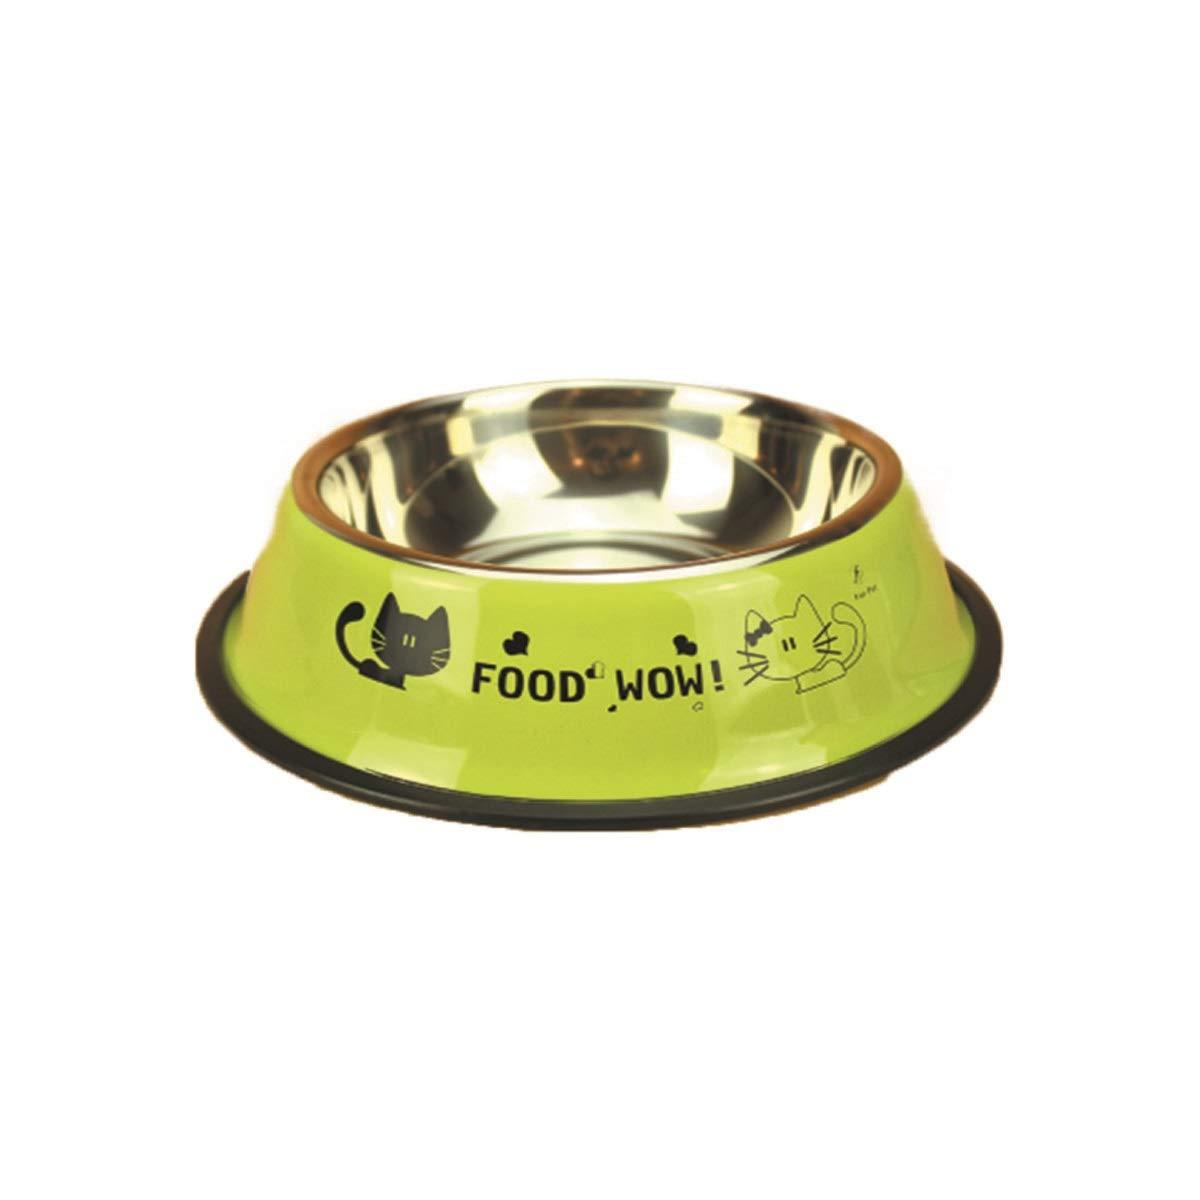 Guyuexuan Cat Bowl, Dog Bowl, Dog Feeder, Q Cat Bowl Vivipet Oblique Mouth Flat Face Cat Pet Cat Bowl Food Bowl Water Bowl Cat Food Eat Ceramic Rice Bowl (color   Pink, Size   S)